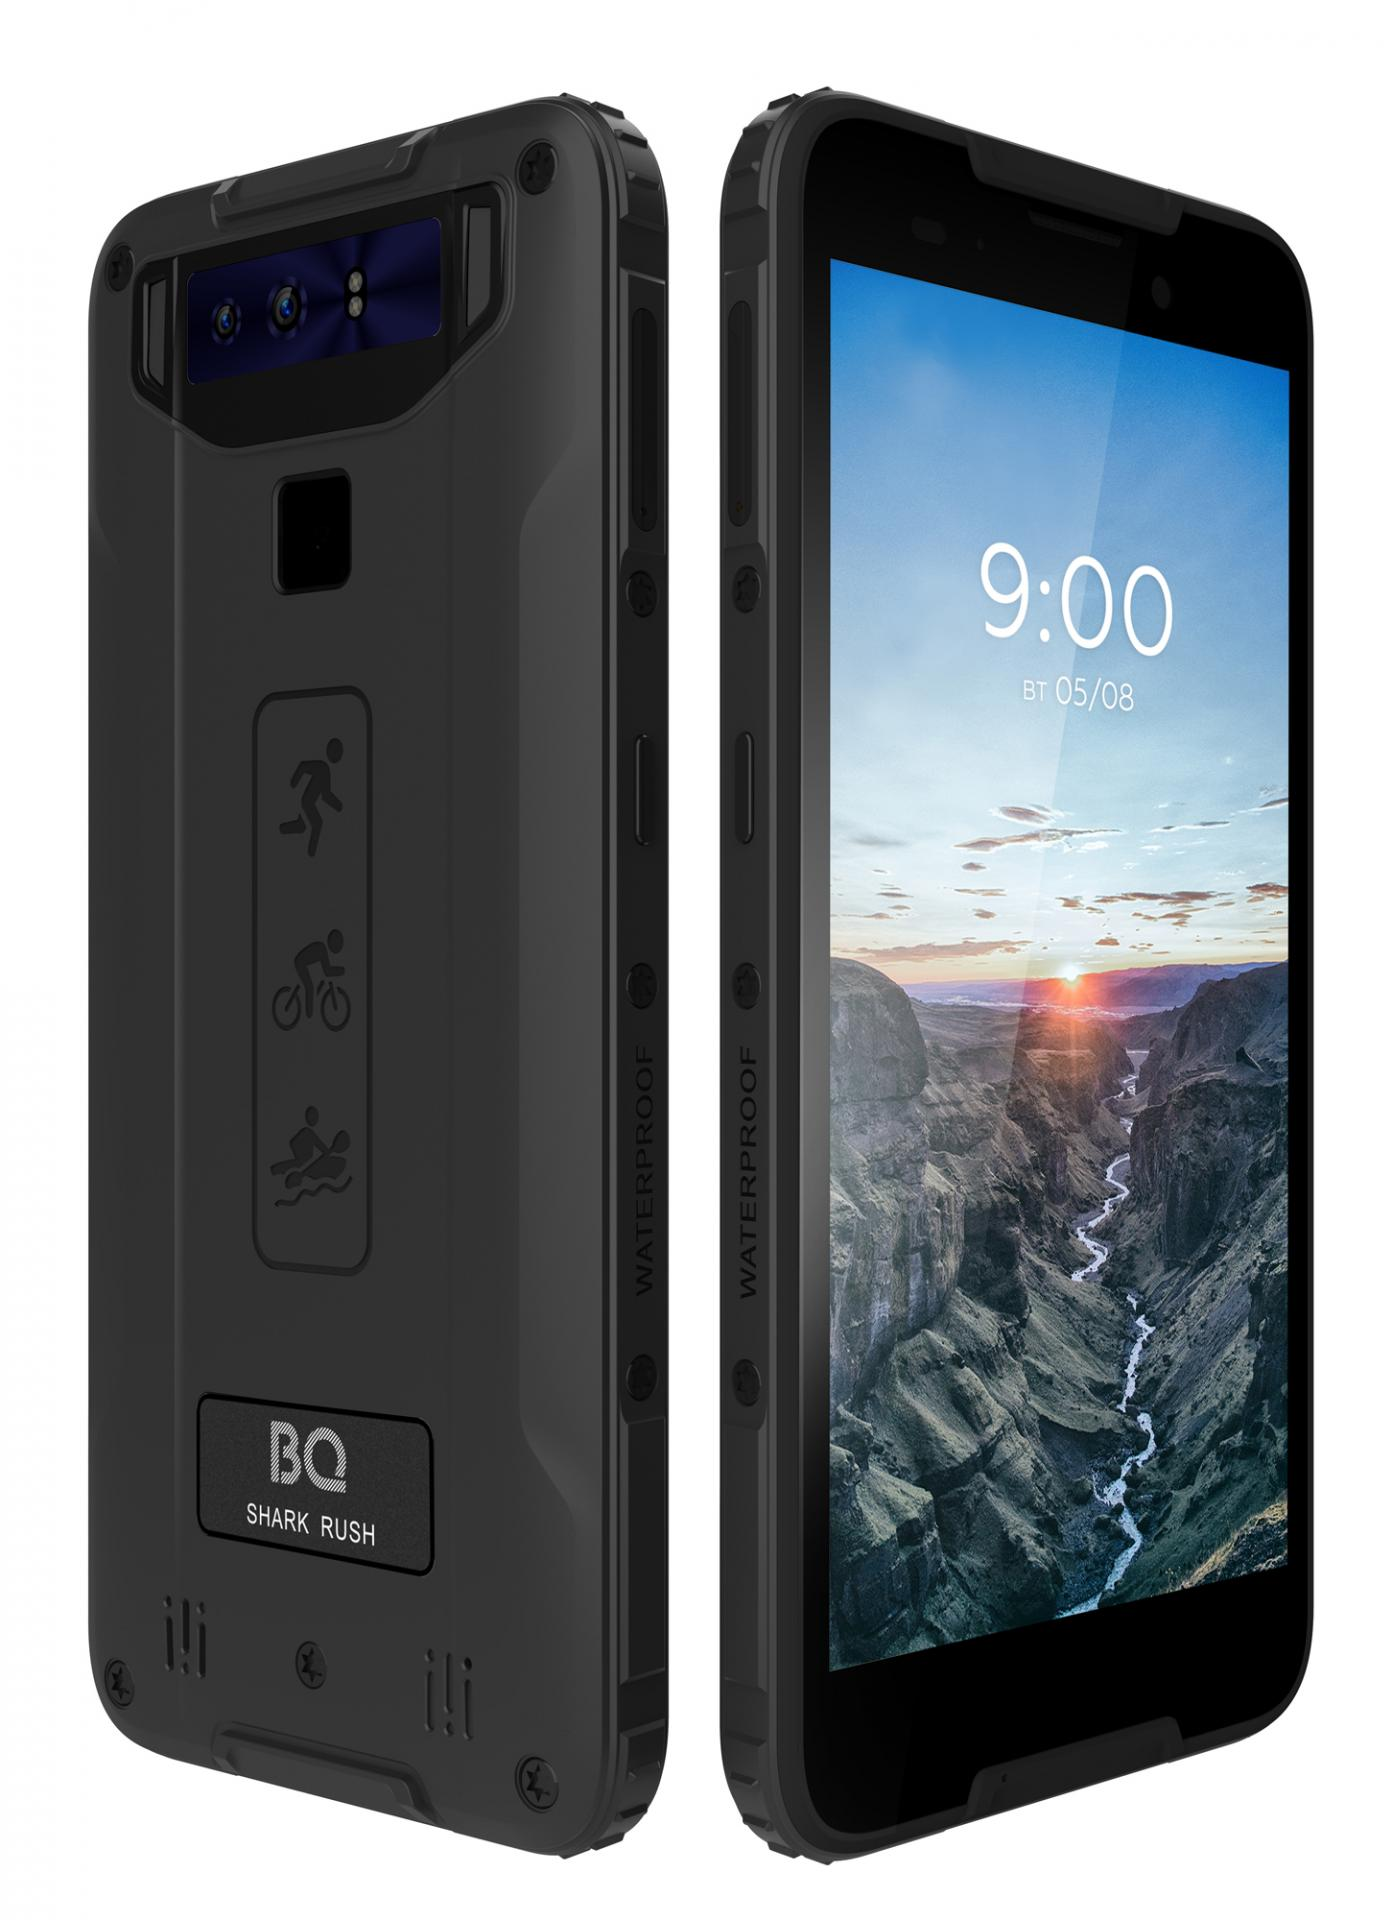 BQпредлагает защищённый поармейским стандартам смартфон 5541L Shark Rush